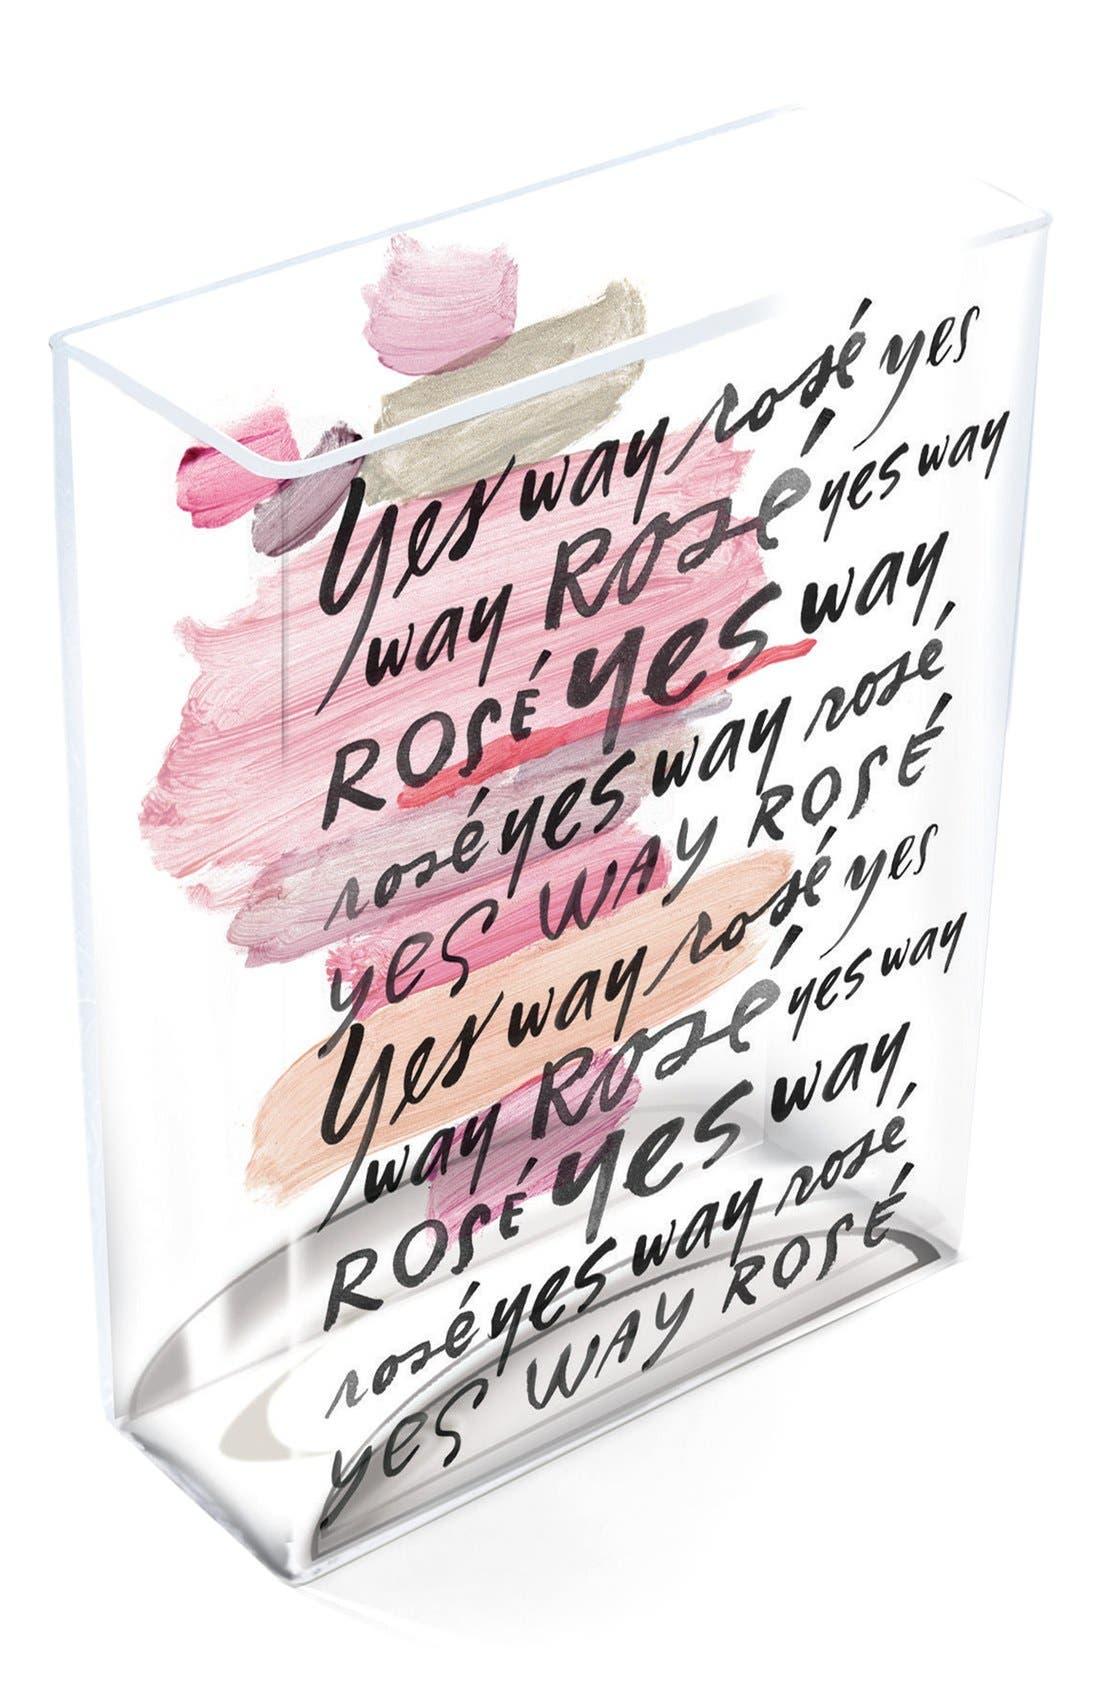 Alternate Image 1 Selected - Fringe Studio Yes Way Rosé Glass Vase